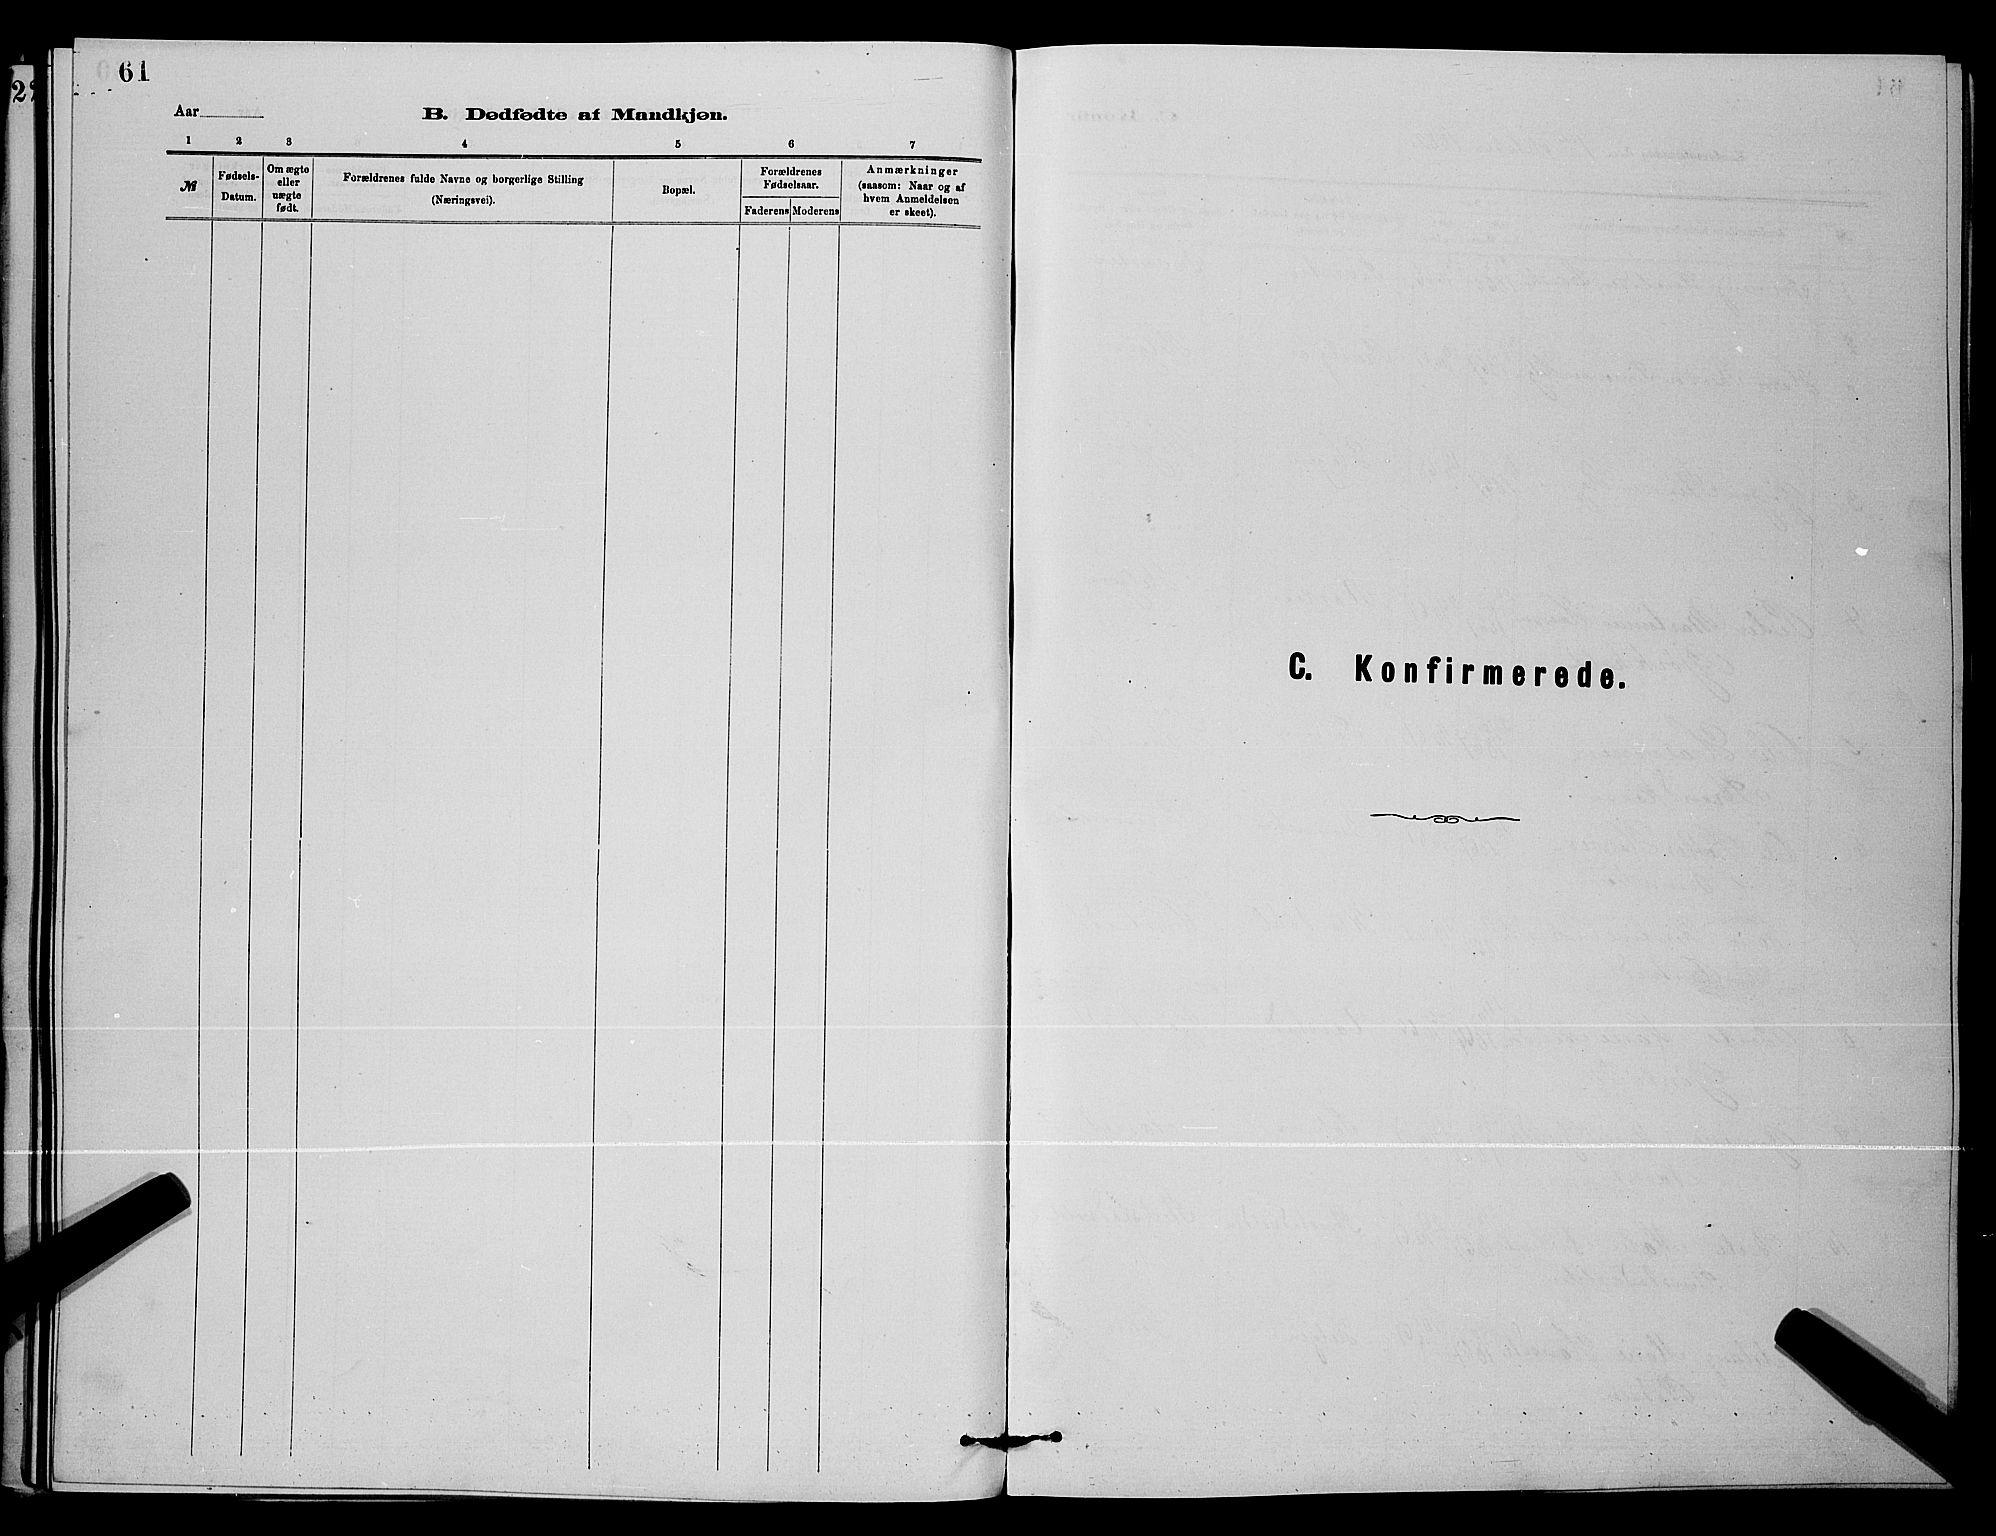 SAKO, Holla kirkebøker, G/Gb/L0001: Klokkerbok nr. II 1, 1882-1897, s. 61